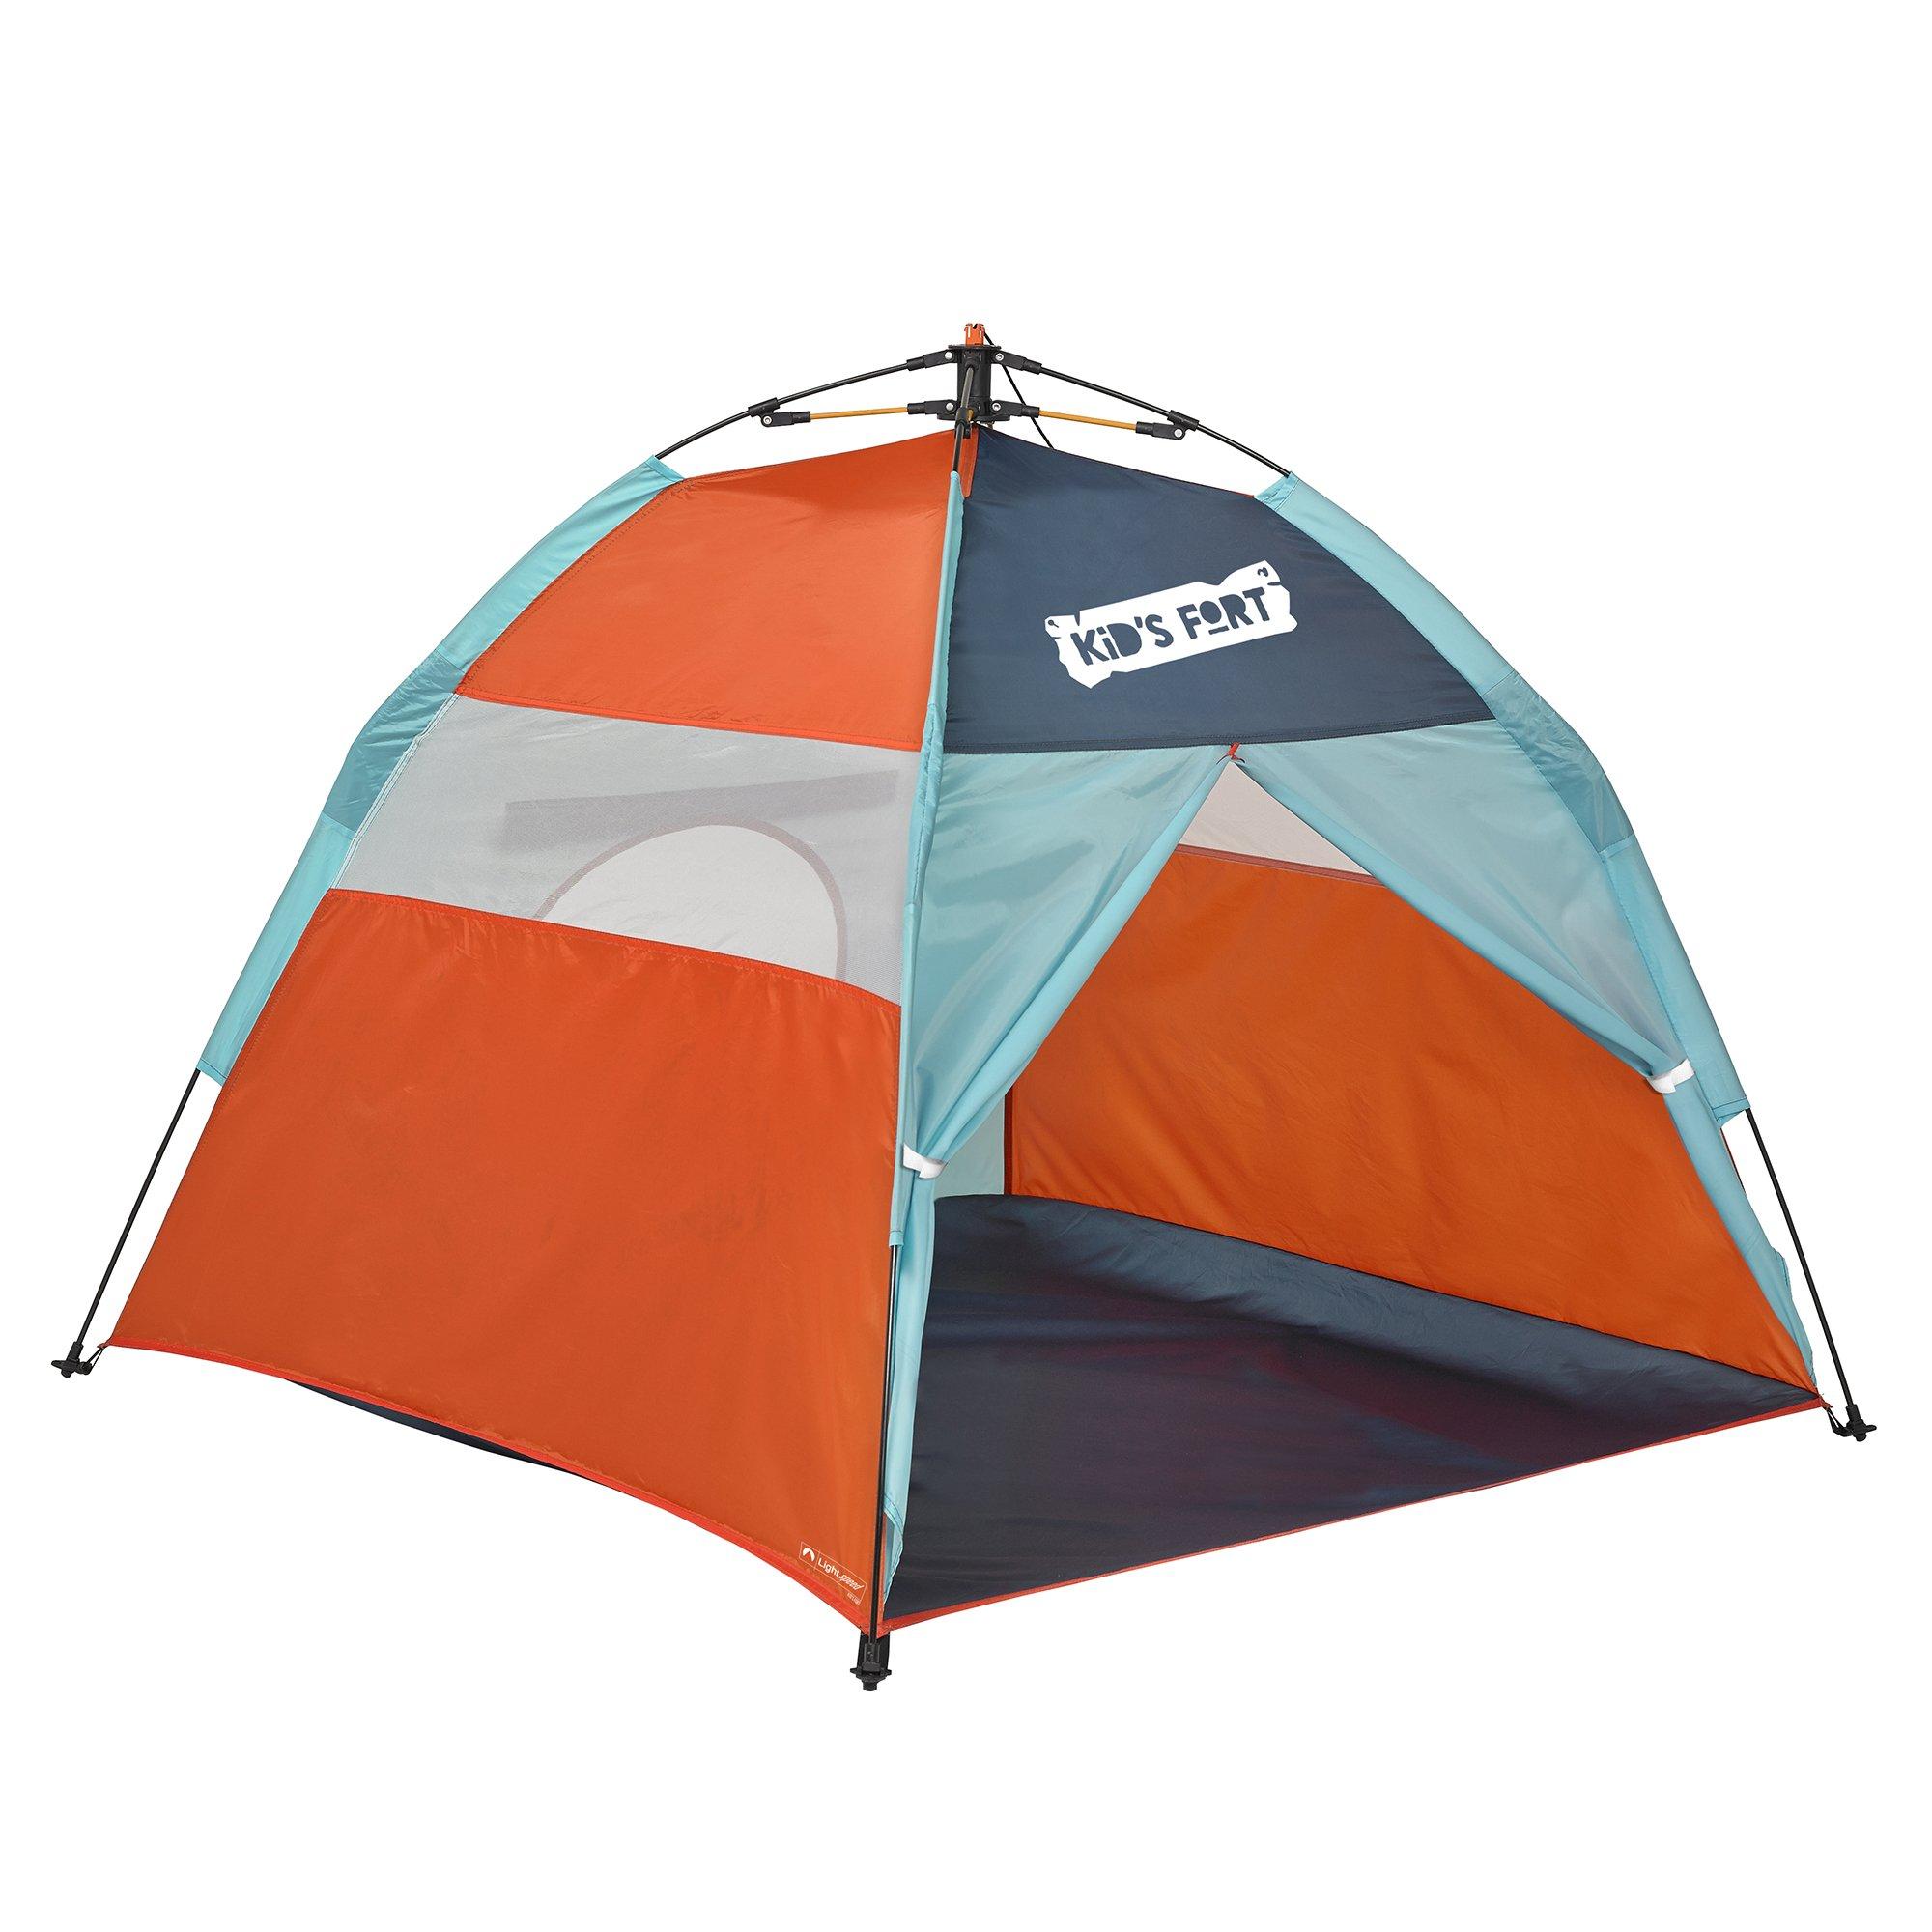 lightspeed outdoors kids fort pop up play tent with tunnel entrance ebay. Black Bedroom Furniture Sets. Home Design Ideas